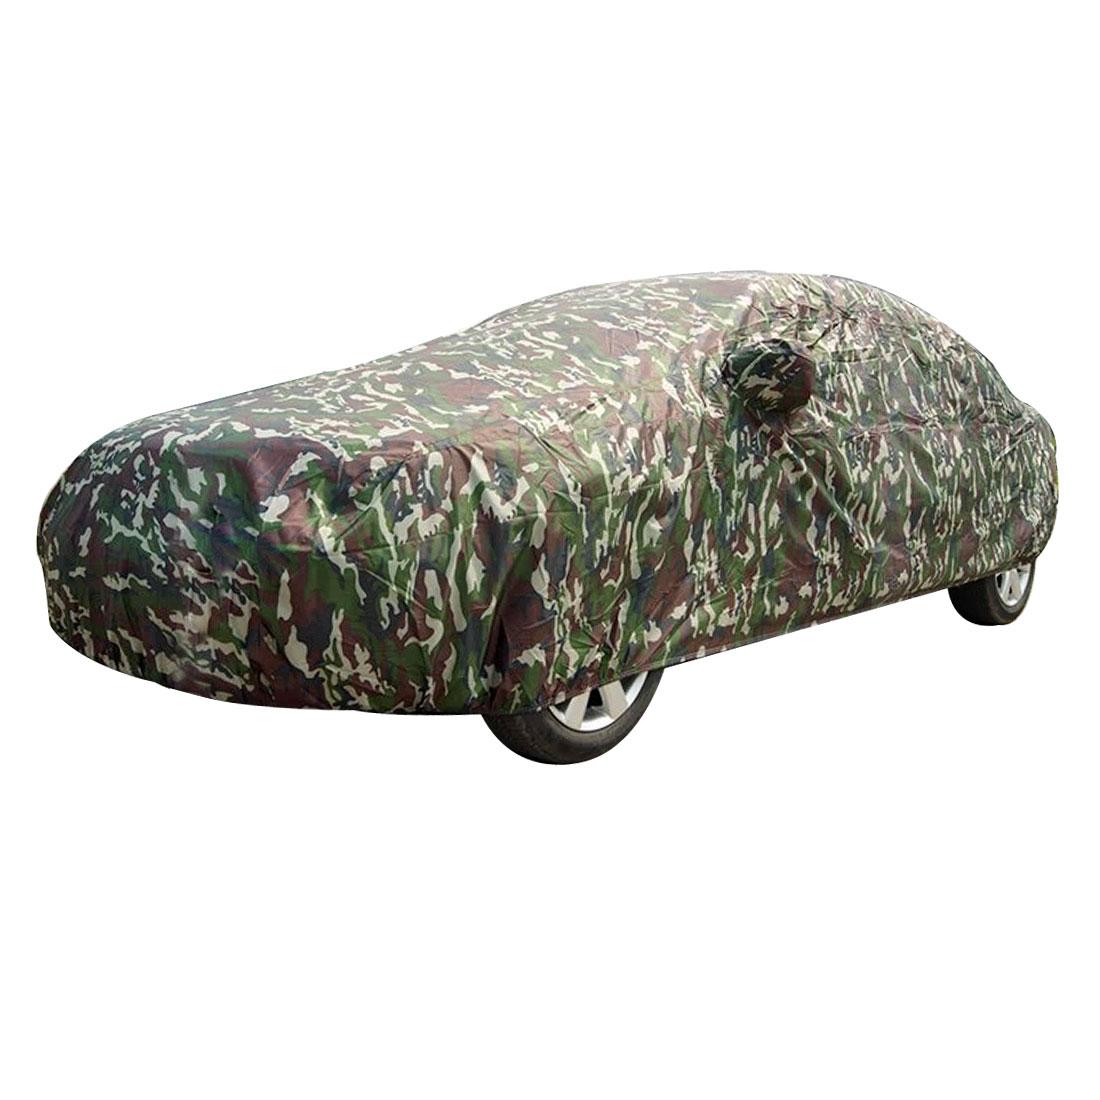 Auto Car Plastic Fleece Camouflage Pattern Snowbreak Half Cover XL